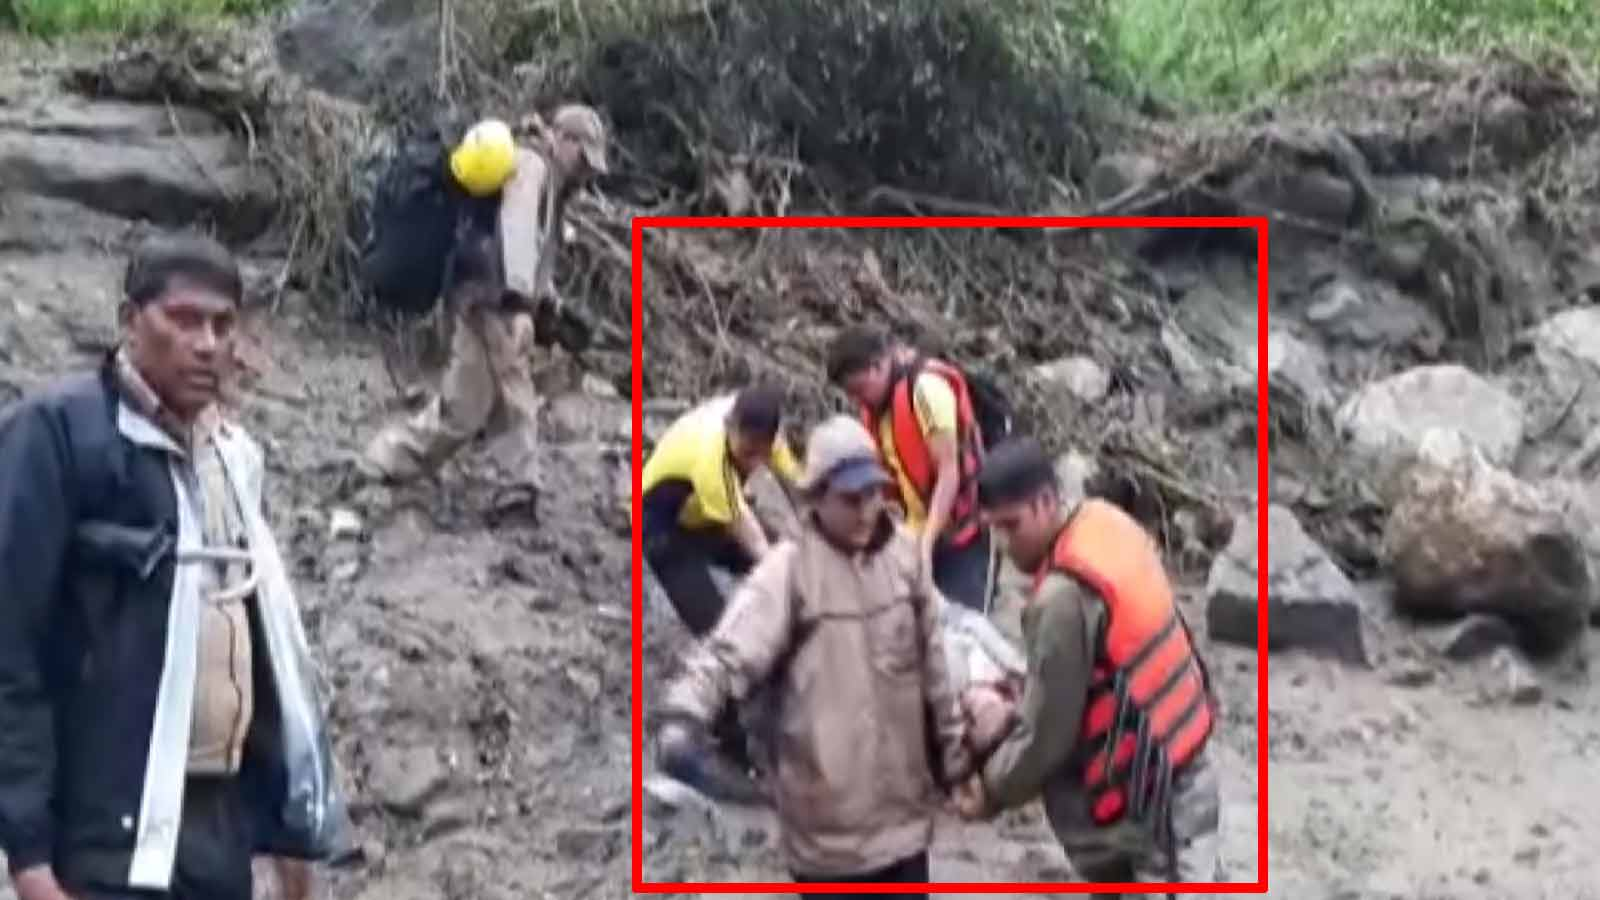 rescue-operations-underway-in-uttarkashis-mori-tehsil-following-cloudburst-in-area